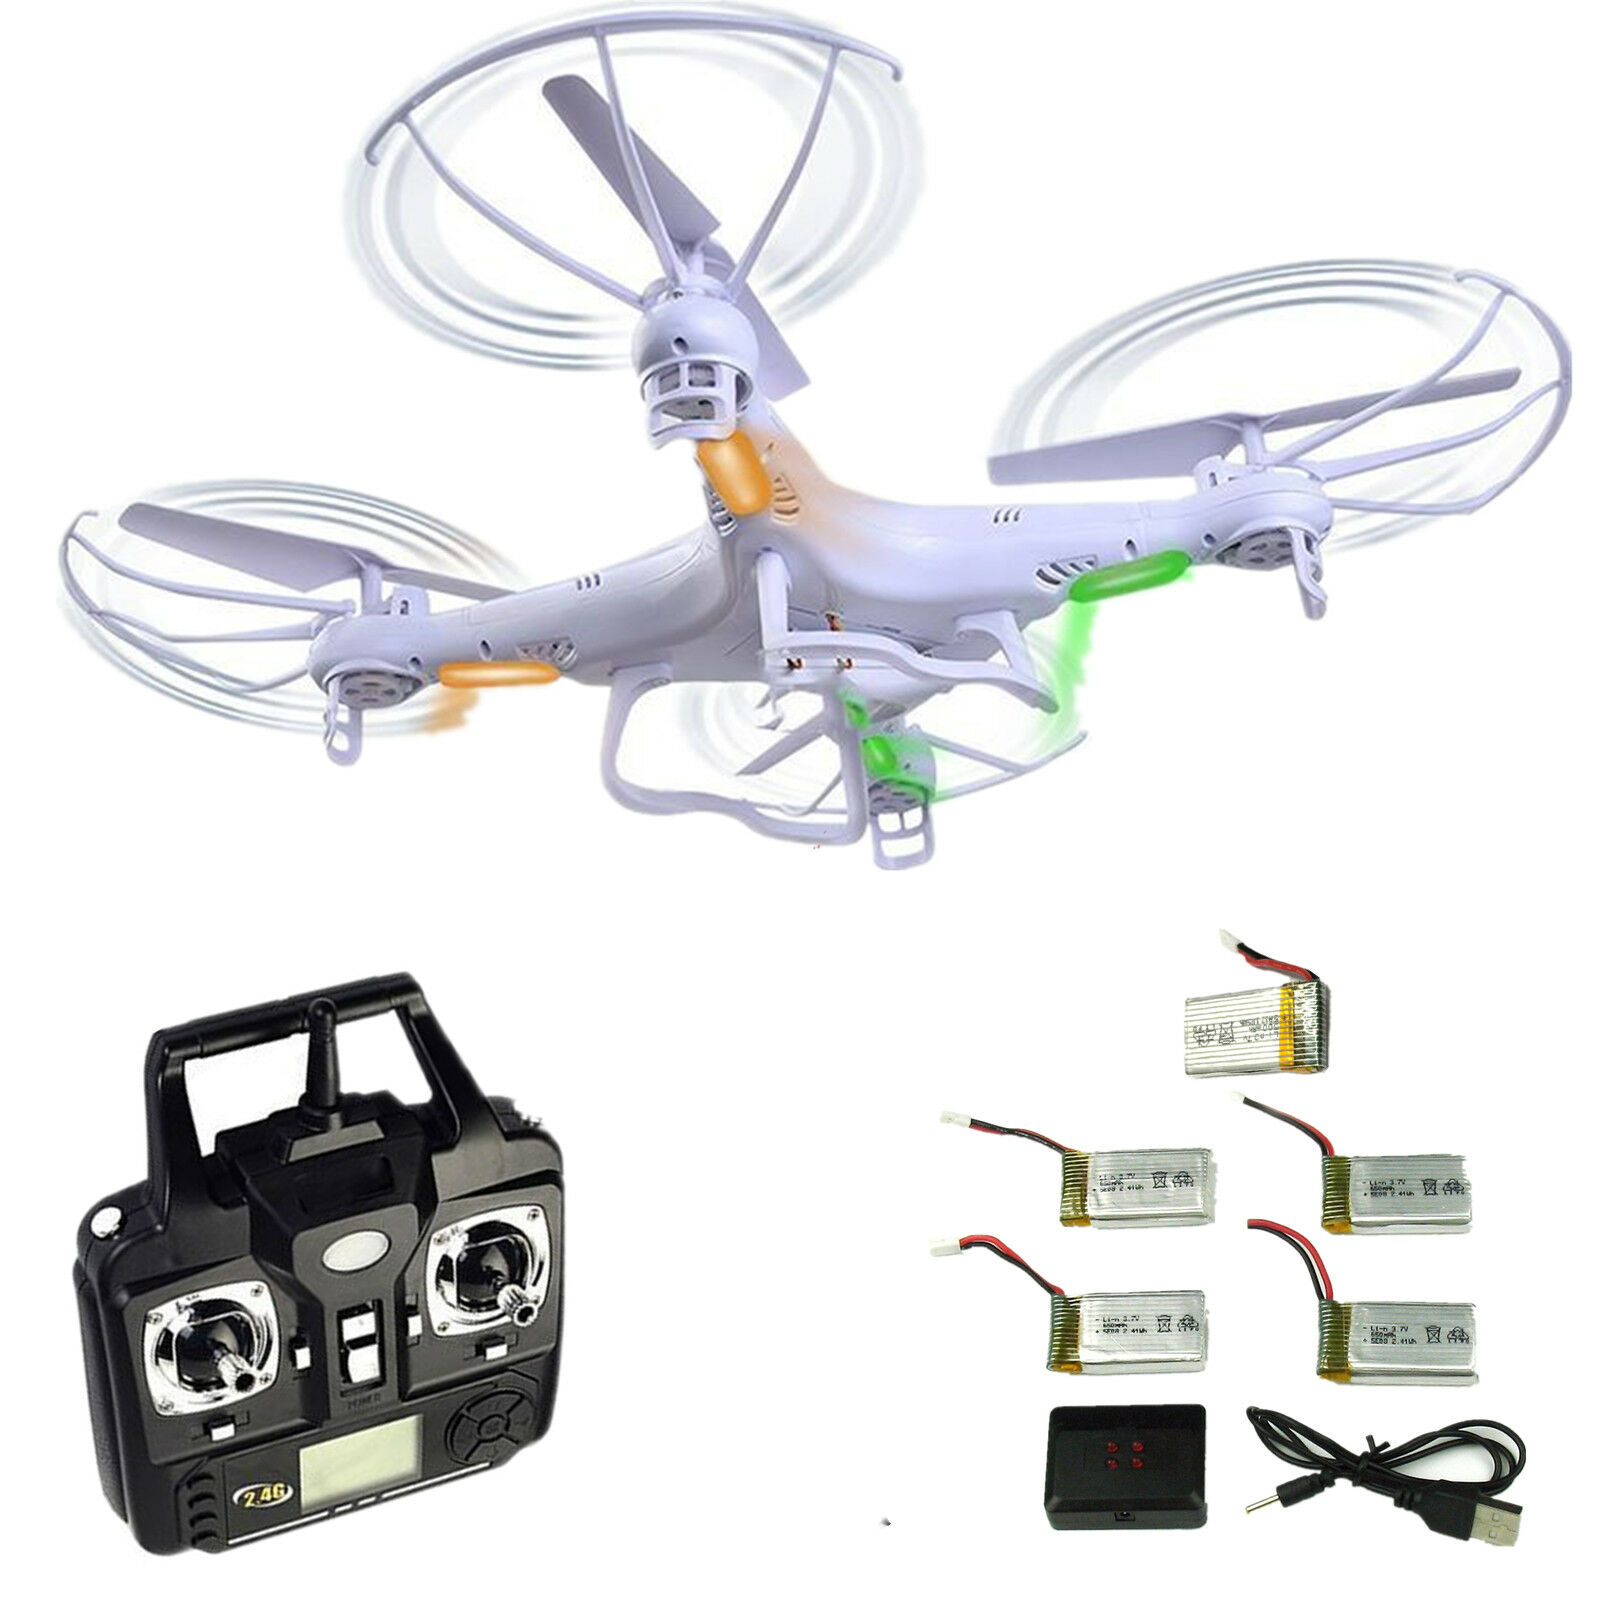 5 batterien syma x5c-1 entdecker 2.4g 4ch 6axis - rc quadcopter drohne uav - rtf